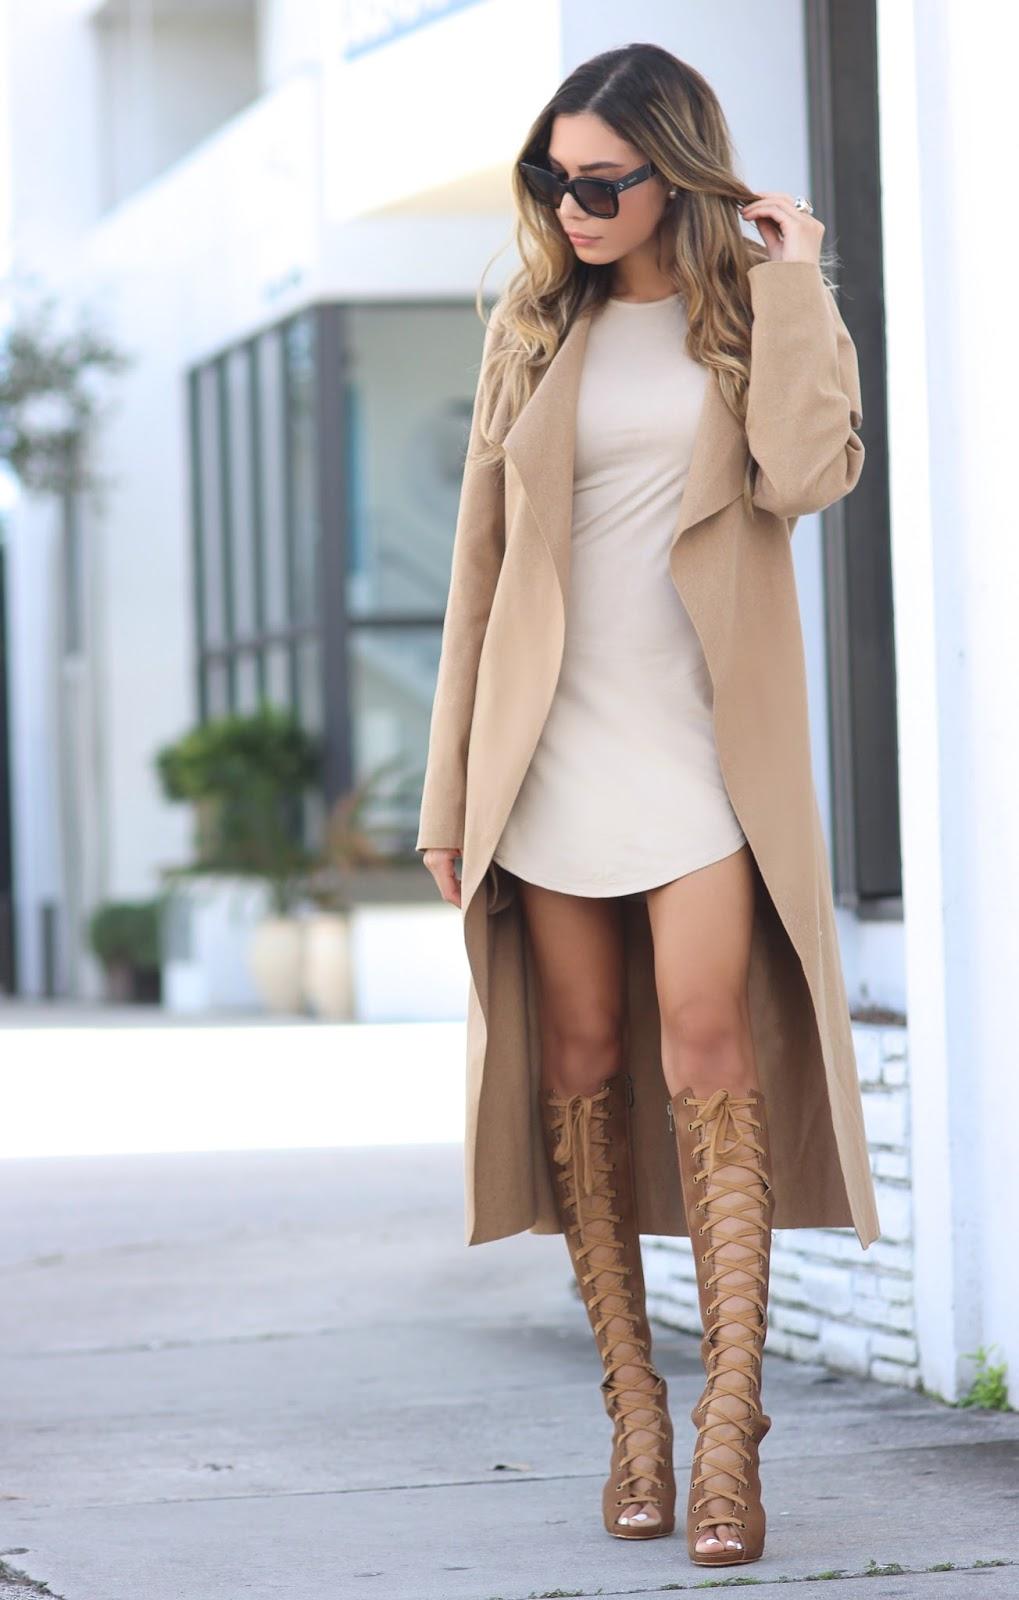 Jasmine Tosh Lately : Nude Is The New Black